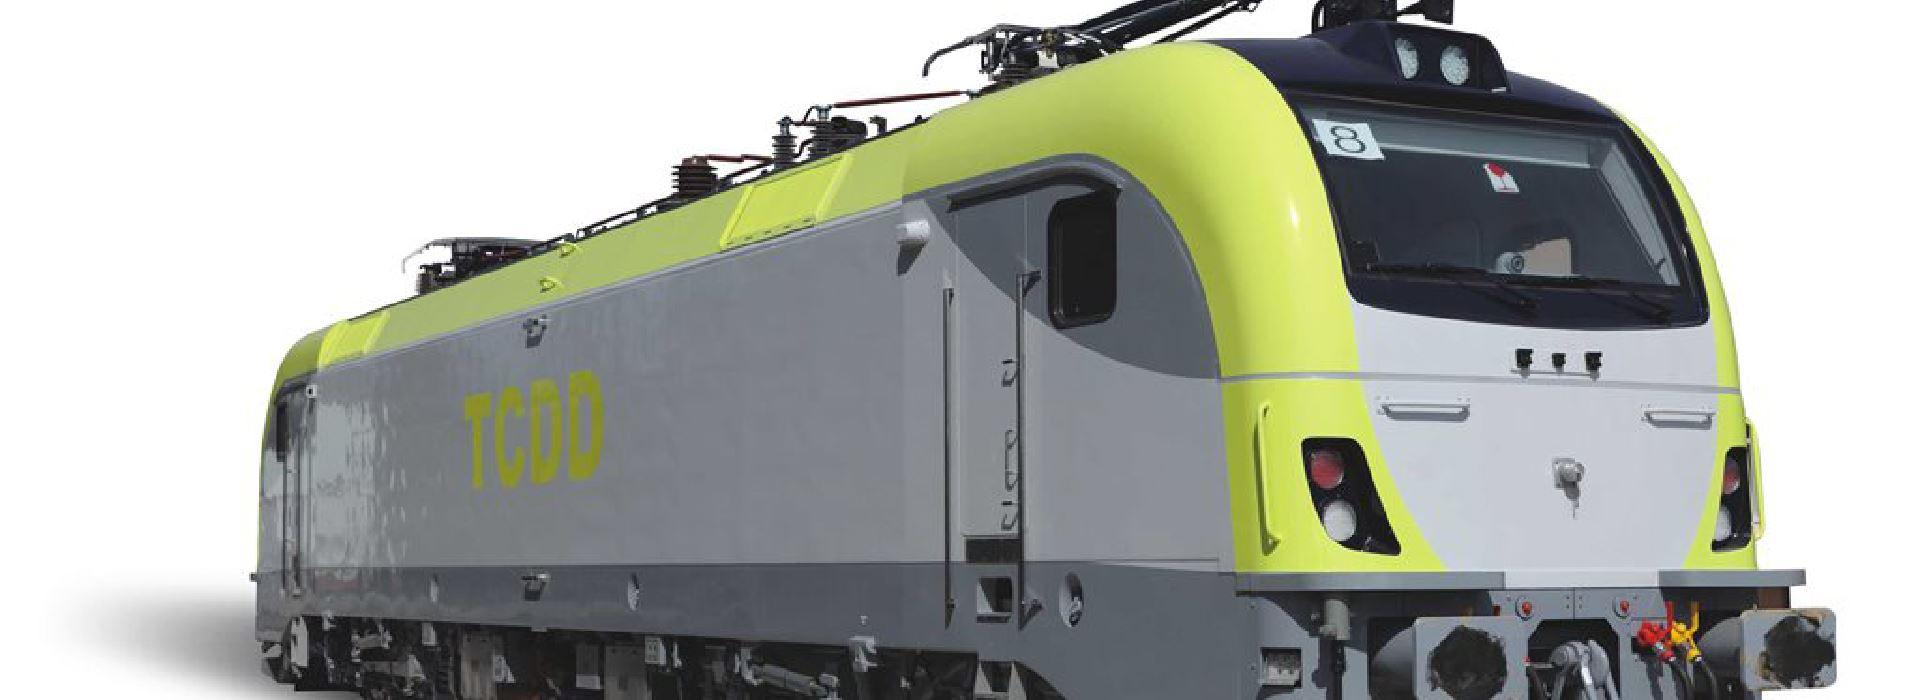 E68000